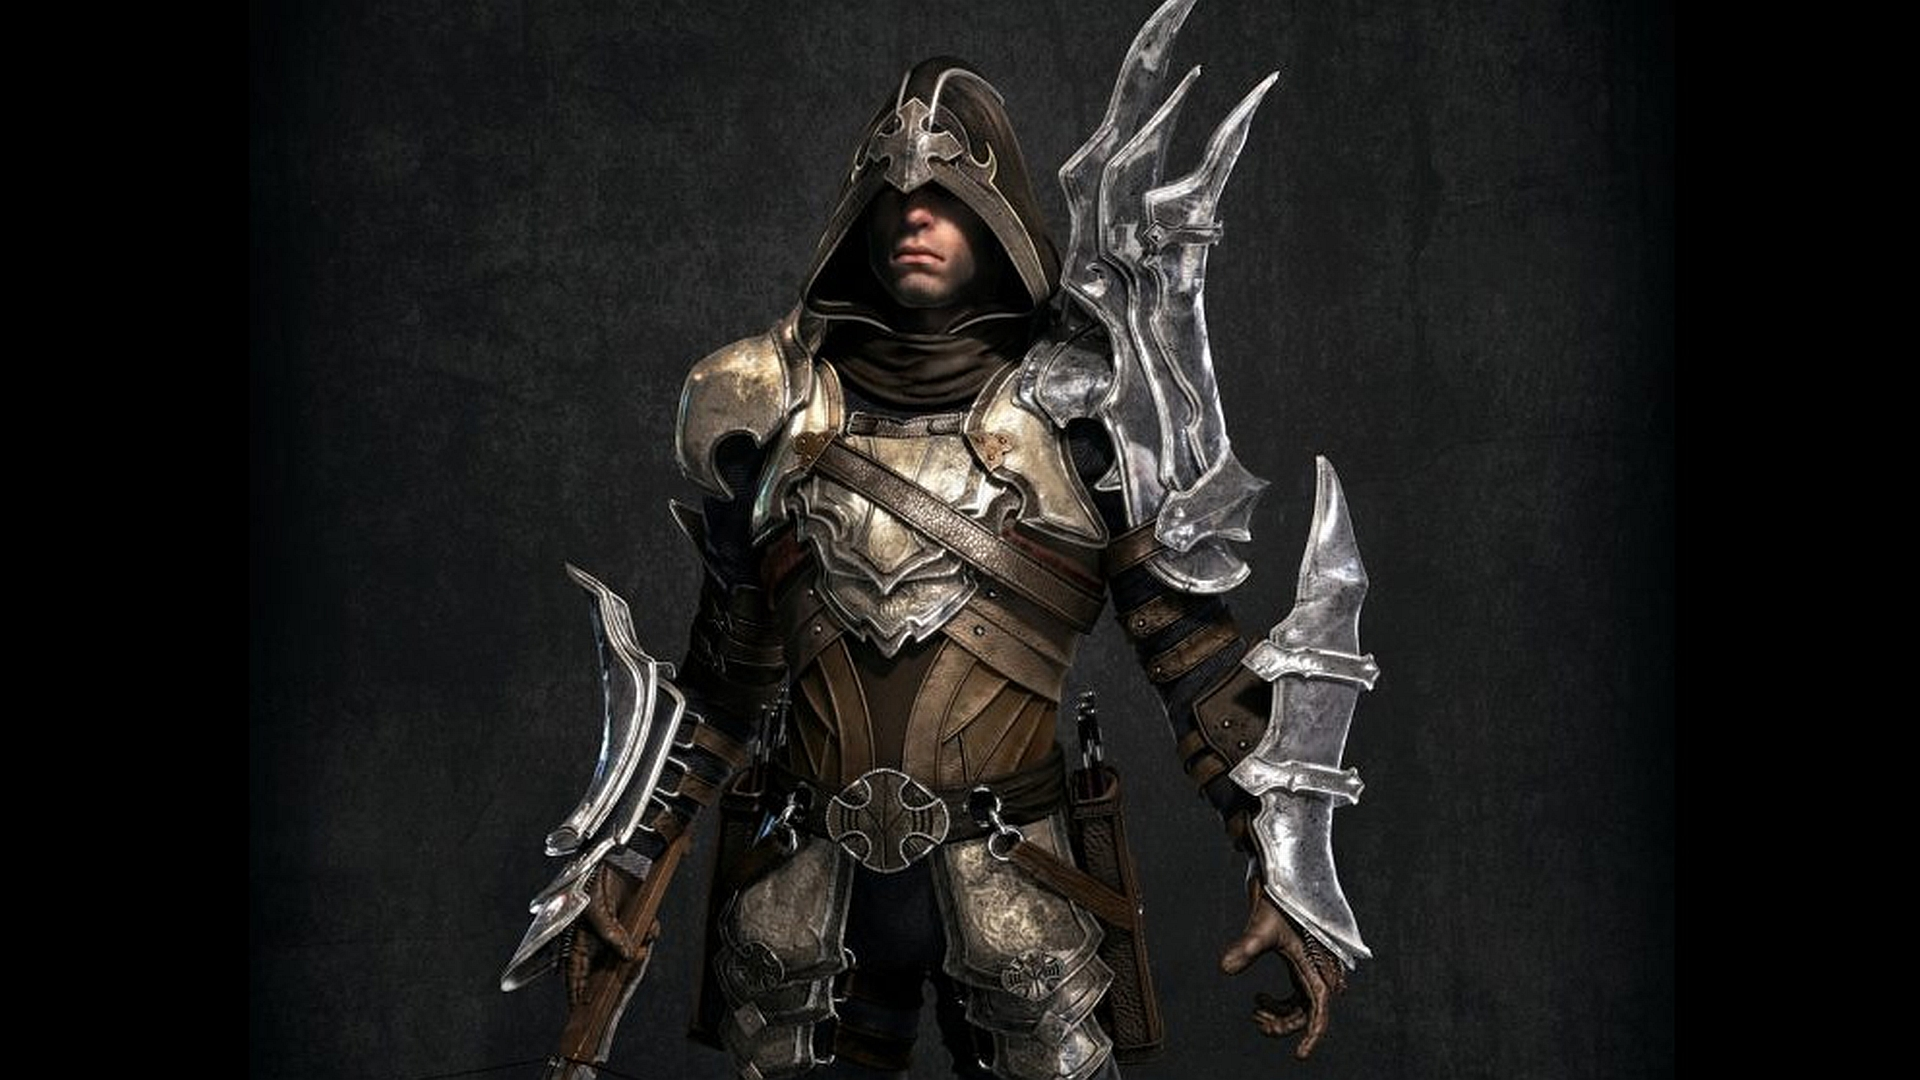 Diablo 3 Wallpaper 1080p